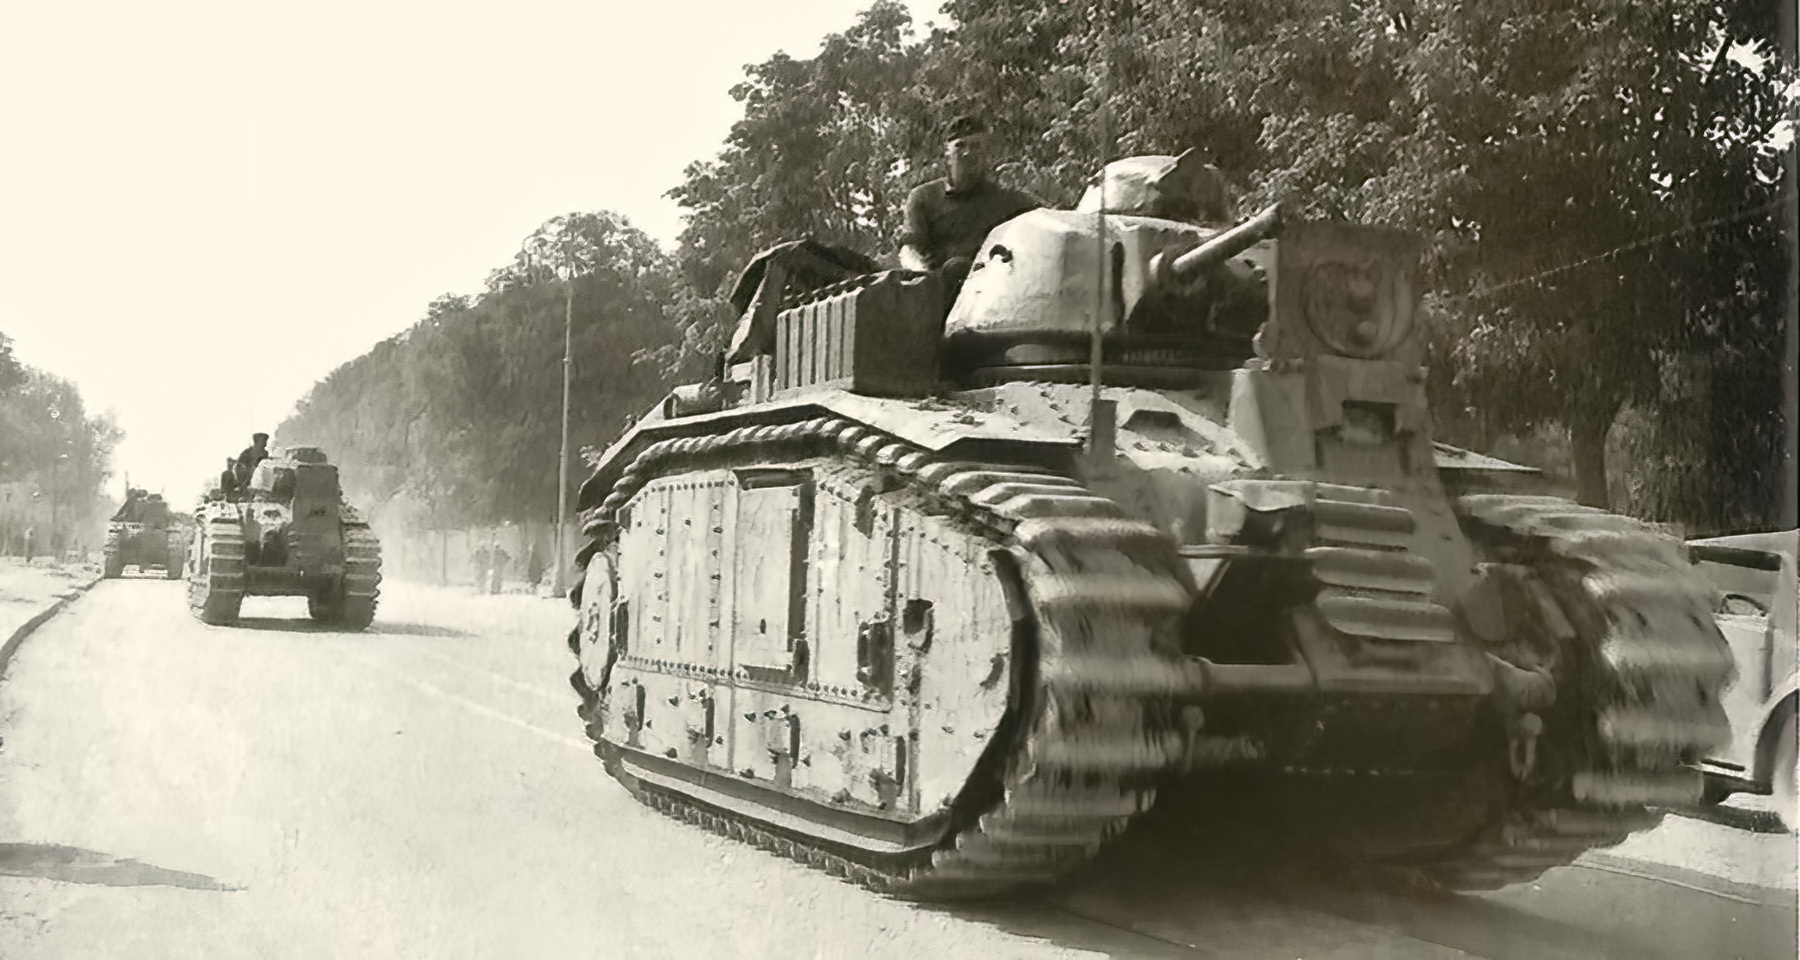 Wehrmacht Flammwagen auf Panzerkampfwagen B2 740(f) flame thrower tank converted Char B1 02